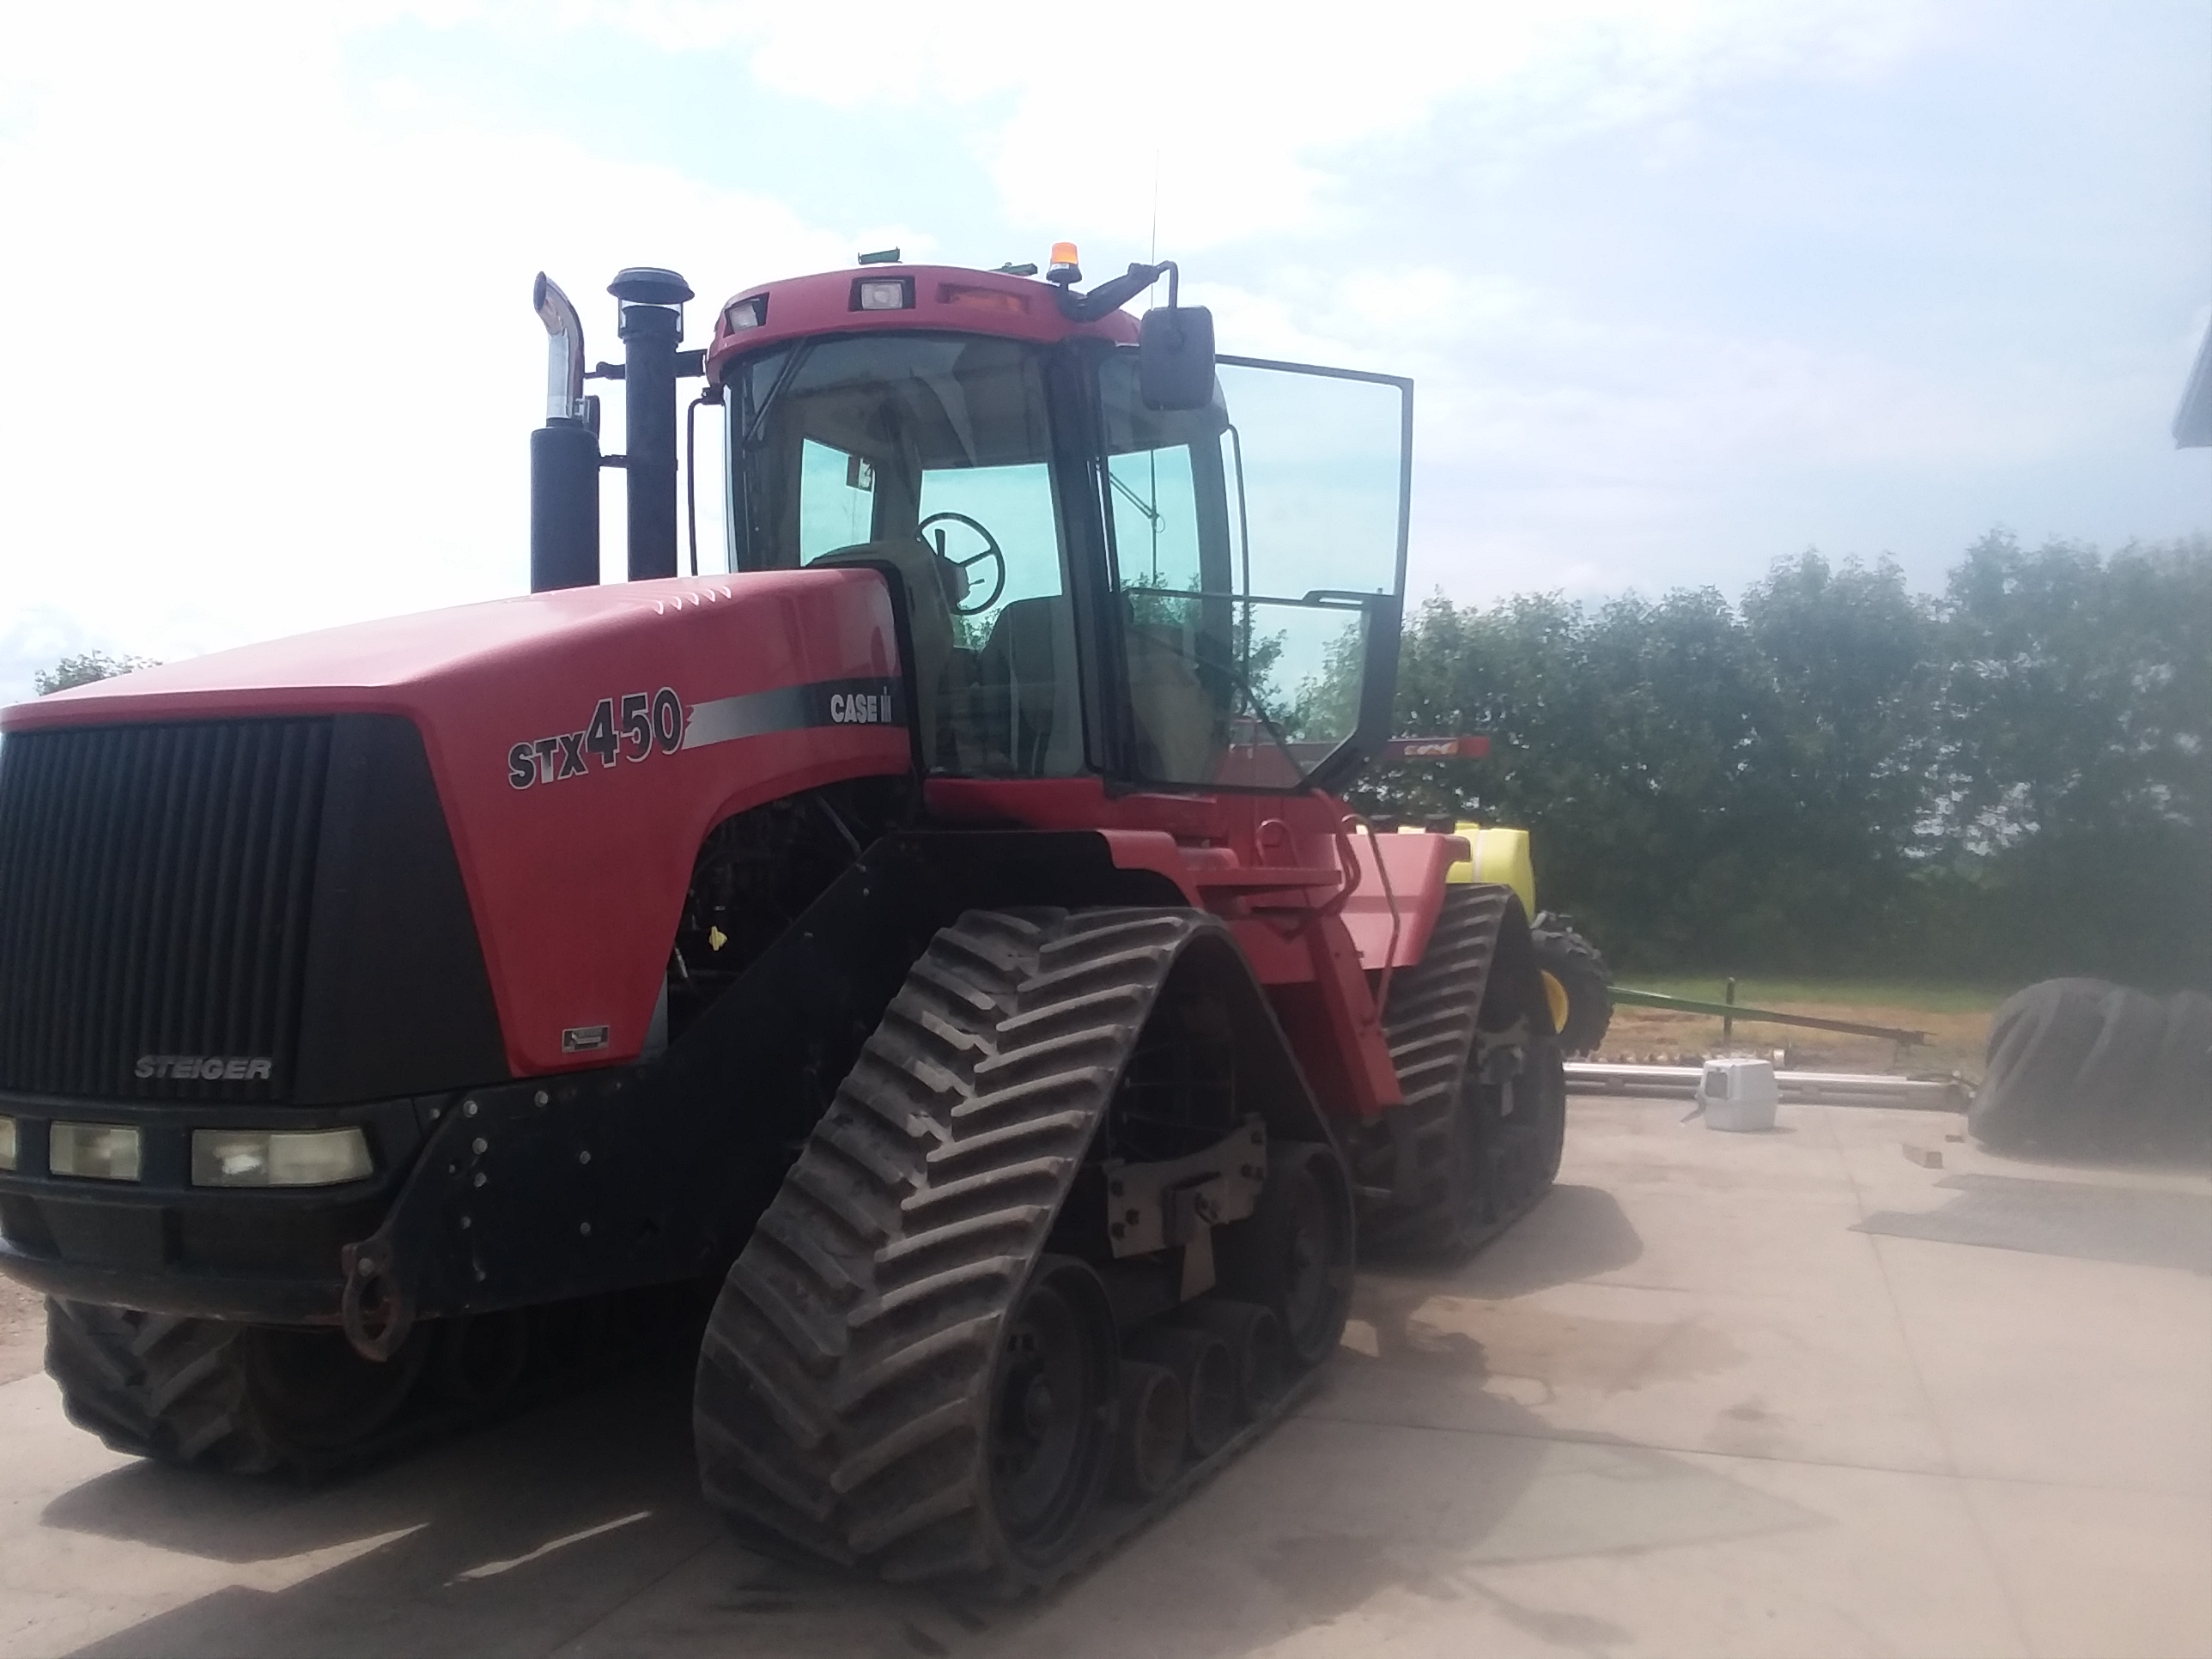 2005 Case IH Steiger 450 QuadTrac Tractor